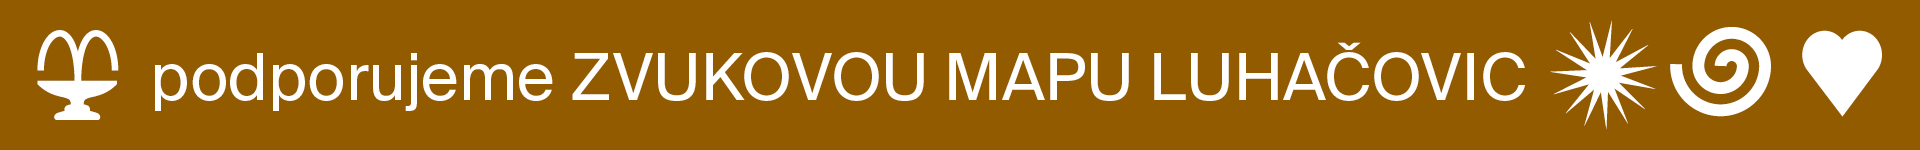 Zvukova mapa Luhacovic banner